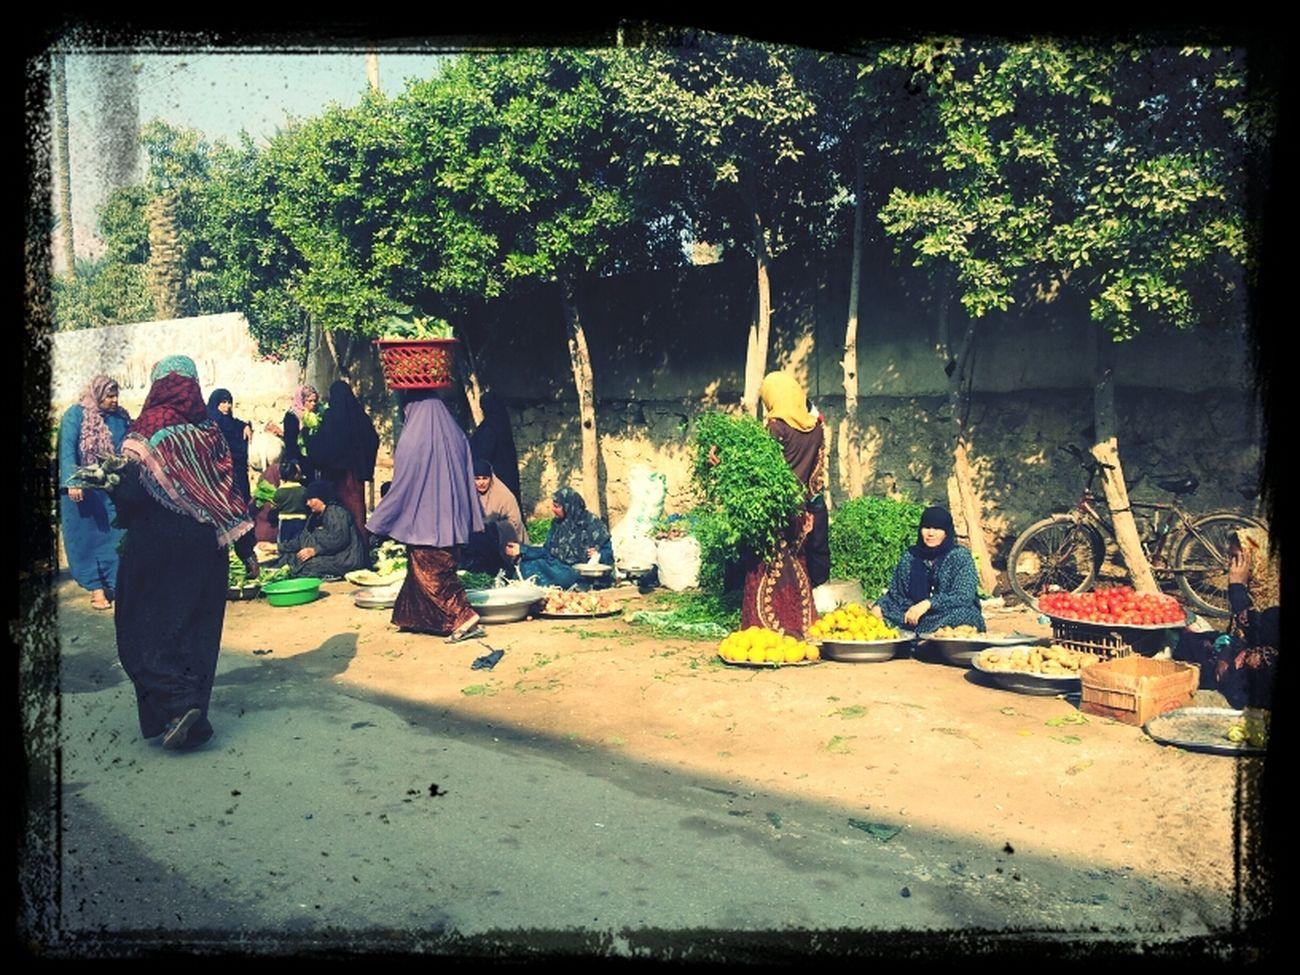 Pasar tani di kwsn kampung Abou Rawas, Giza~ Malaysia dlu2 cmni agaknya....